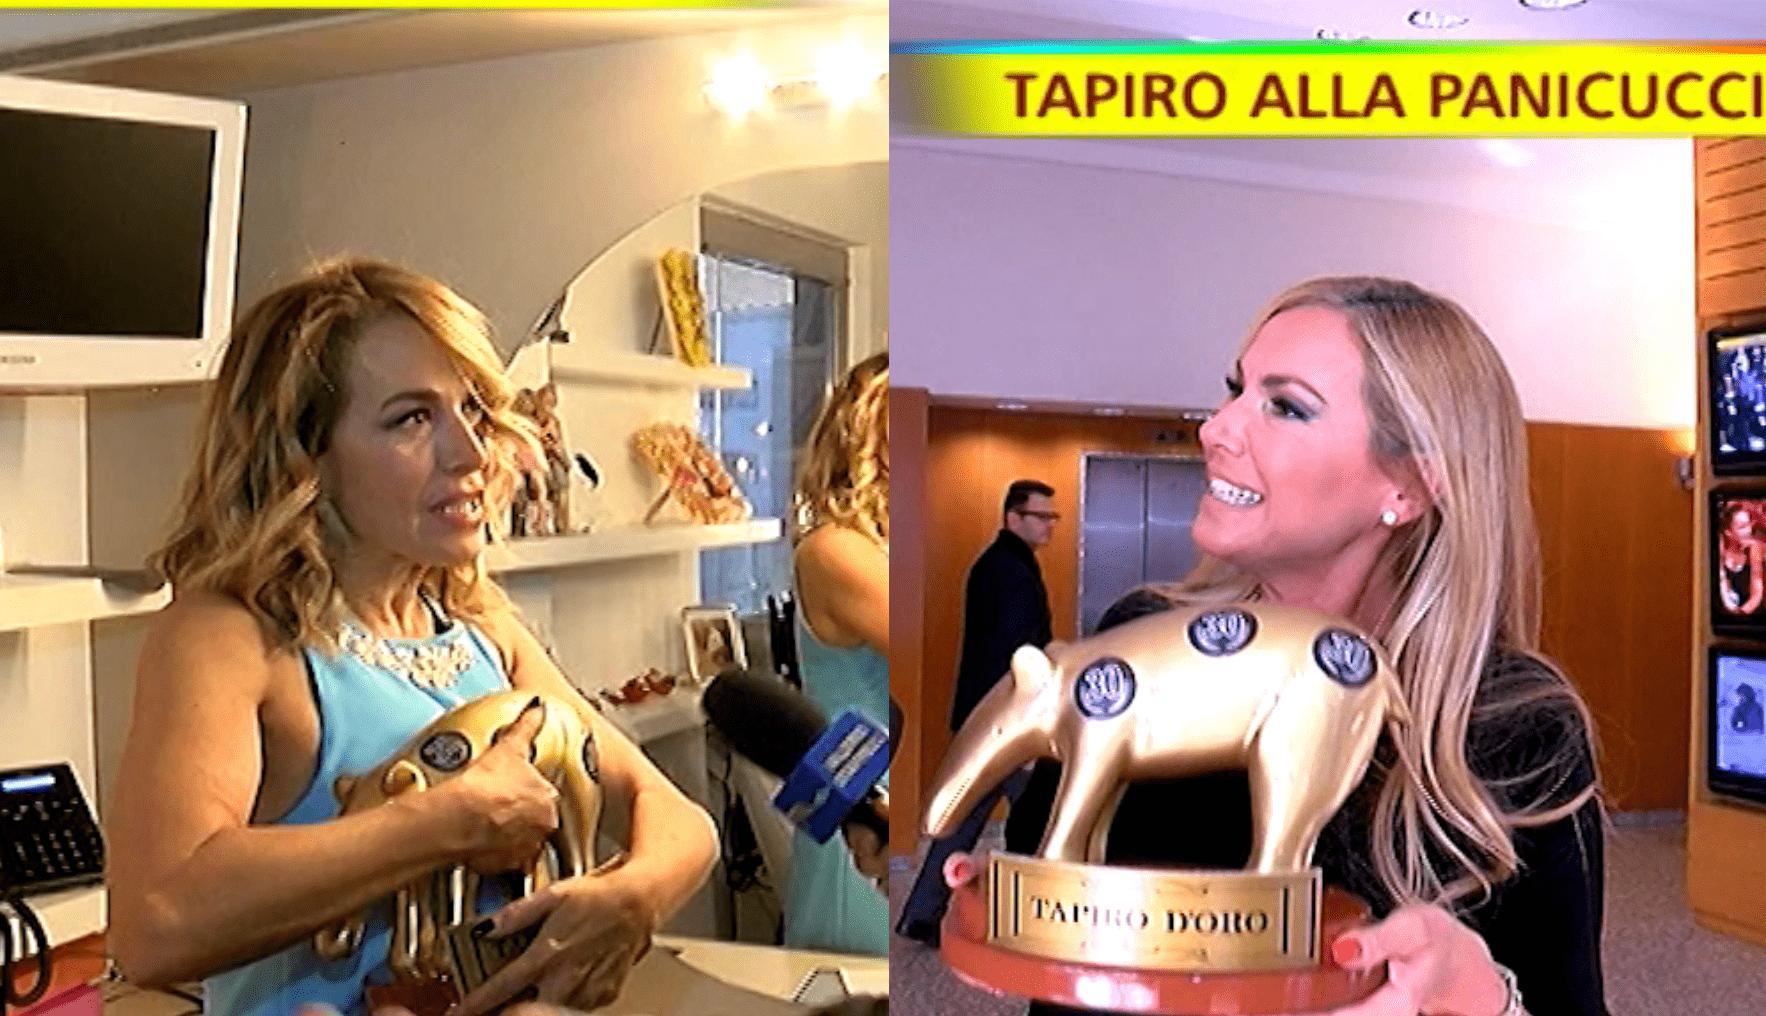 Barbara D'Urso e Federica Panicucci, pace tra le conduttrici Mediaset? I rumors